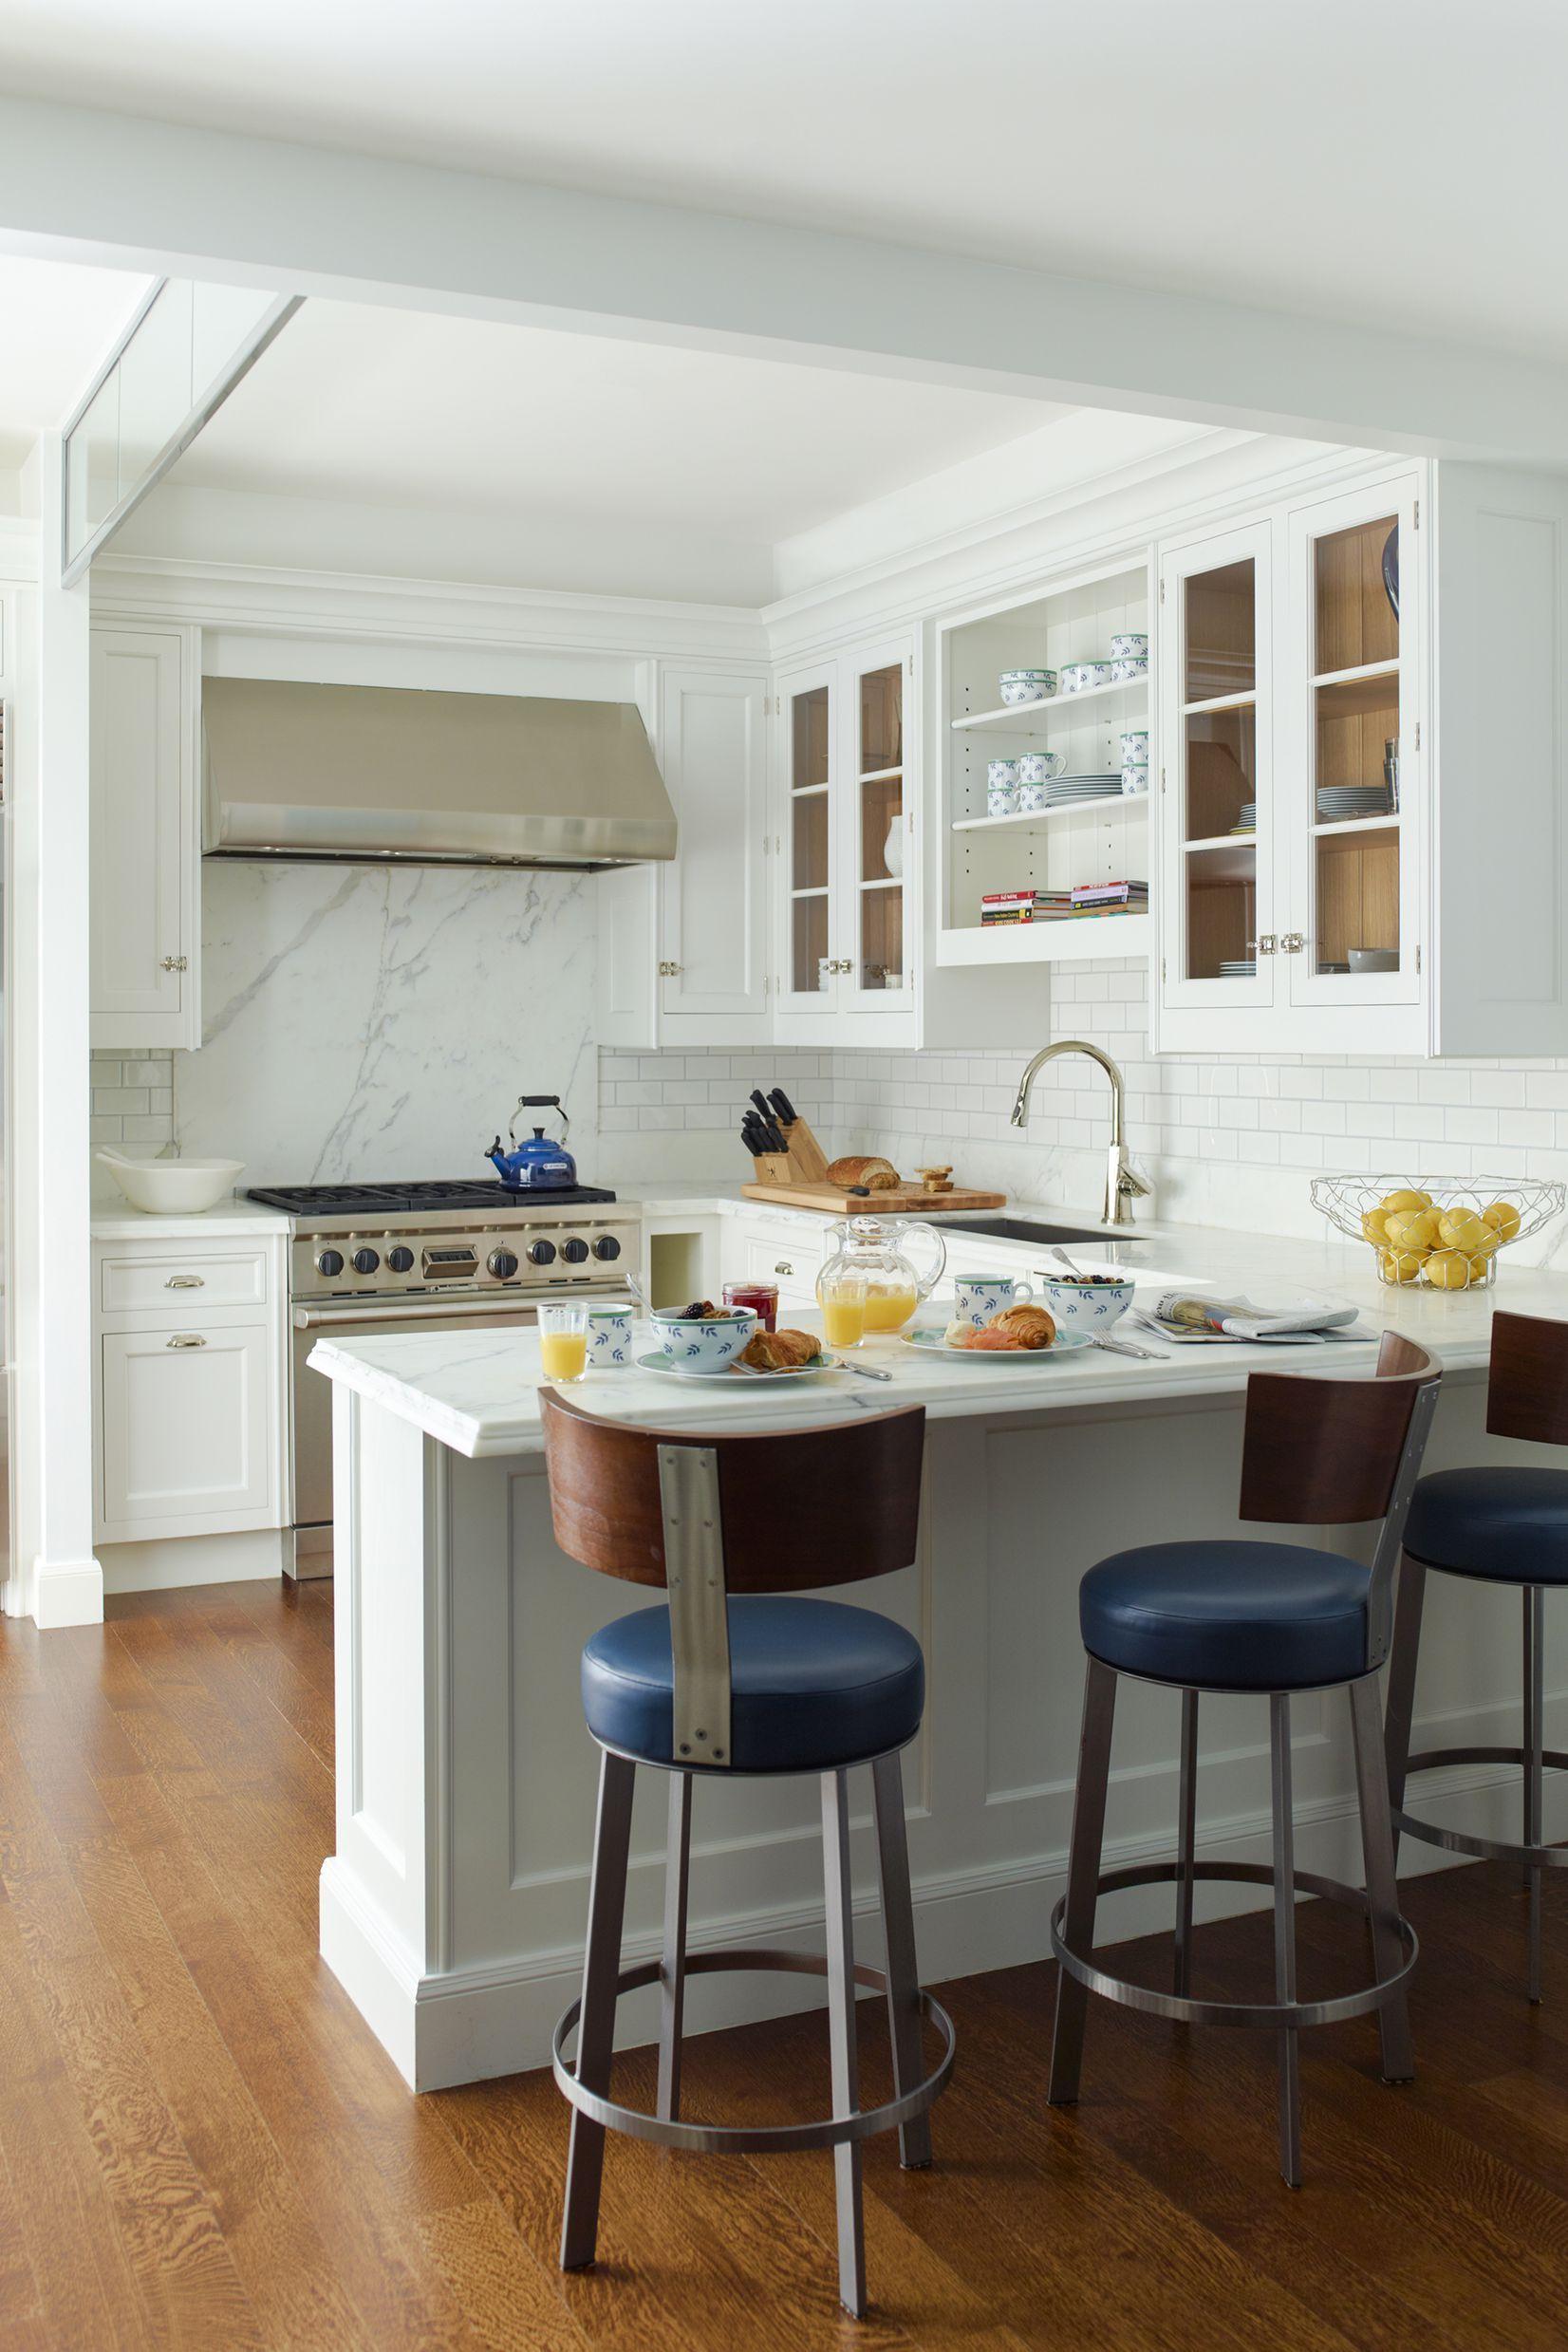 Small Kitchen Design 10x10: 27 Simple Small Kitchen Ideas To Maximize Space [Trick